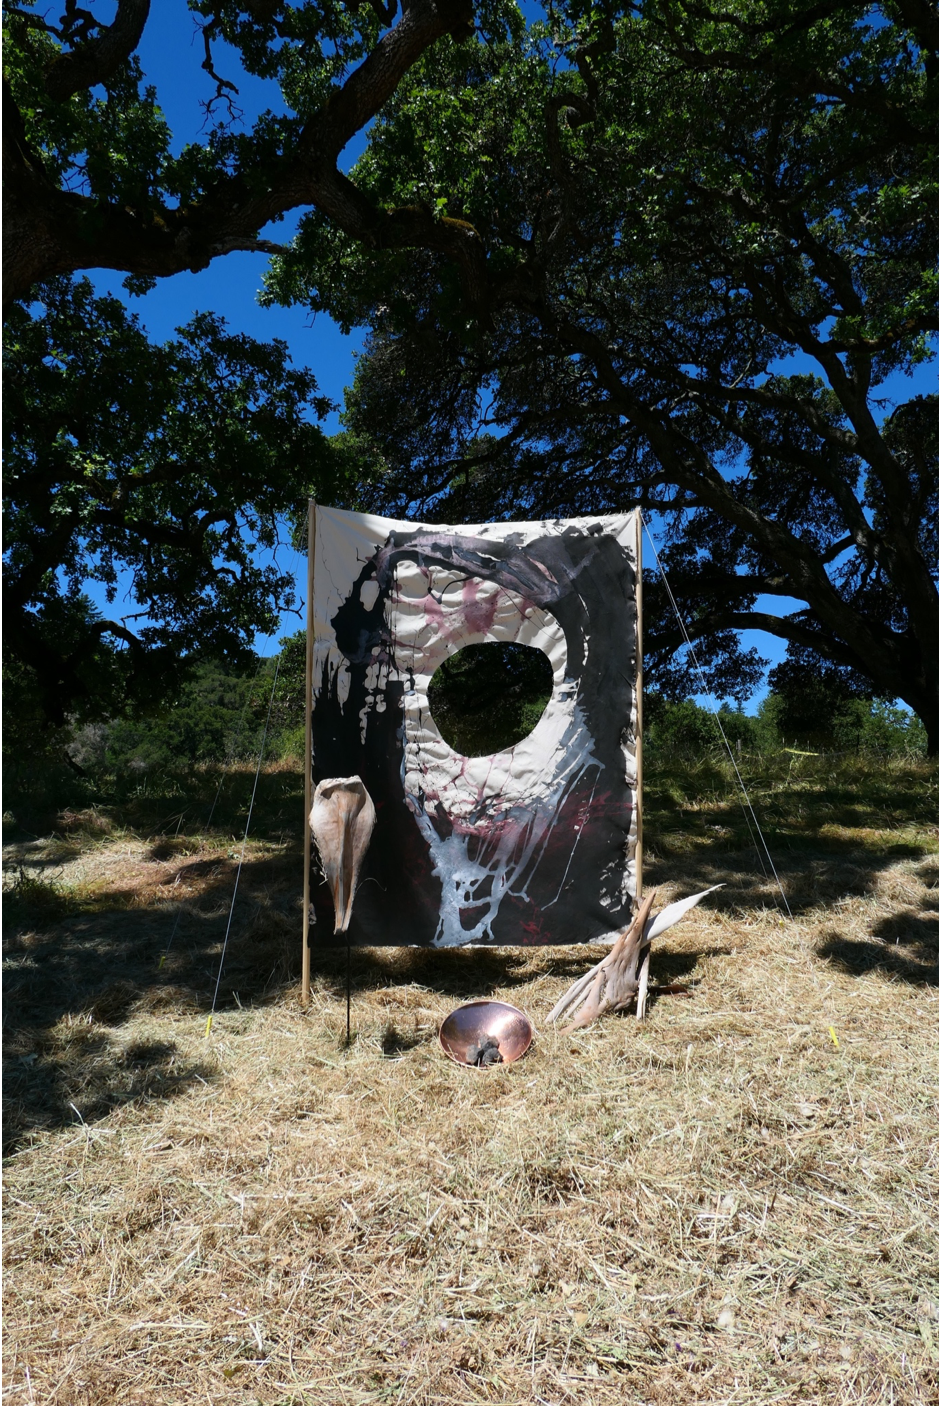 installation view at Woodside, California, acrylic on canvas, copper plate, volcanic stones, eucalyptus tree barks, palm tree bark